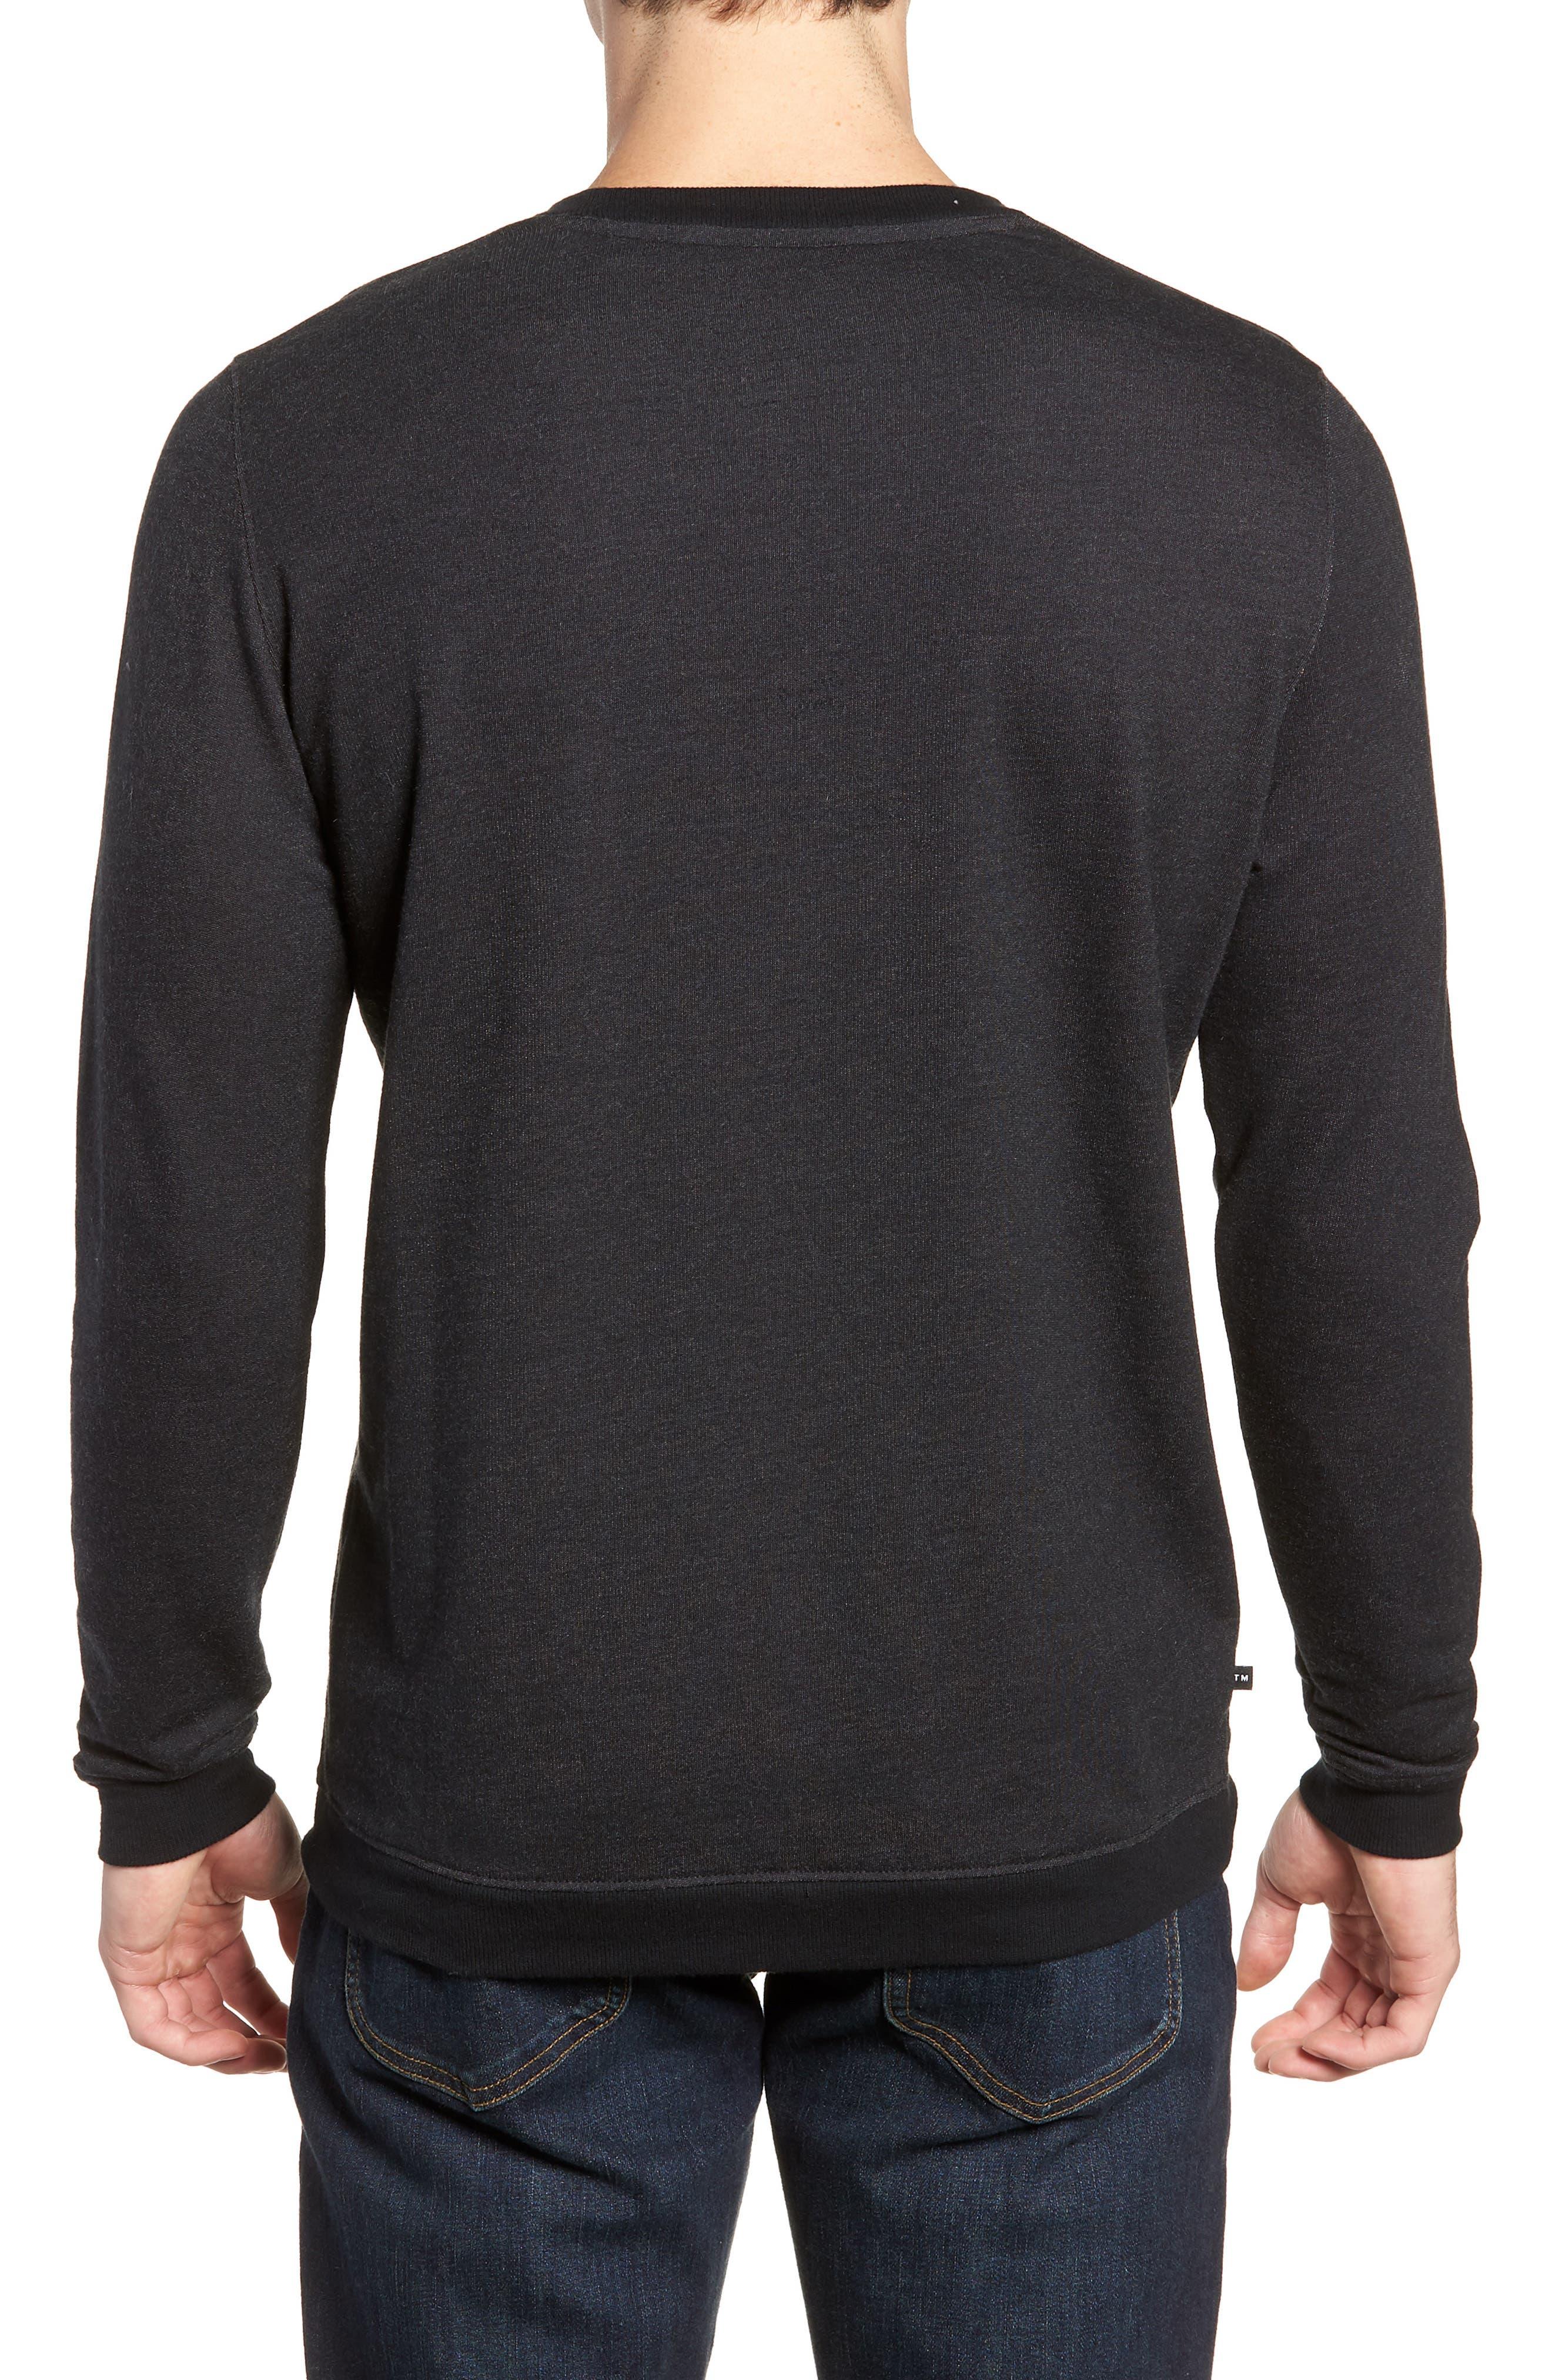 Lanegan Long Sleeve T-Shirt,                             Alternate thumbnail 2, color,                             BLACK/ WINETASTING